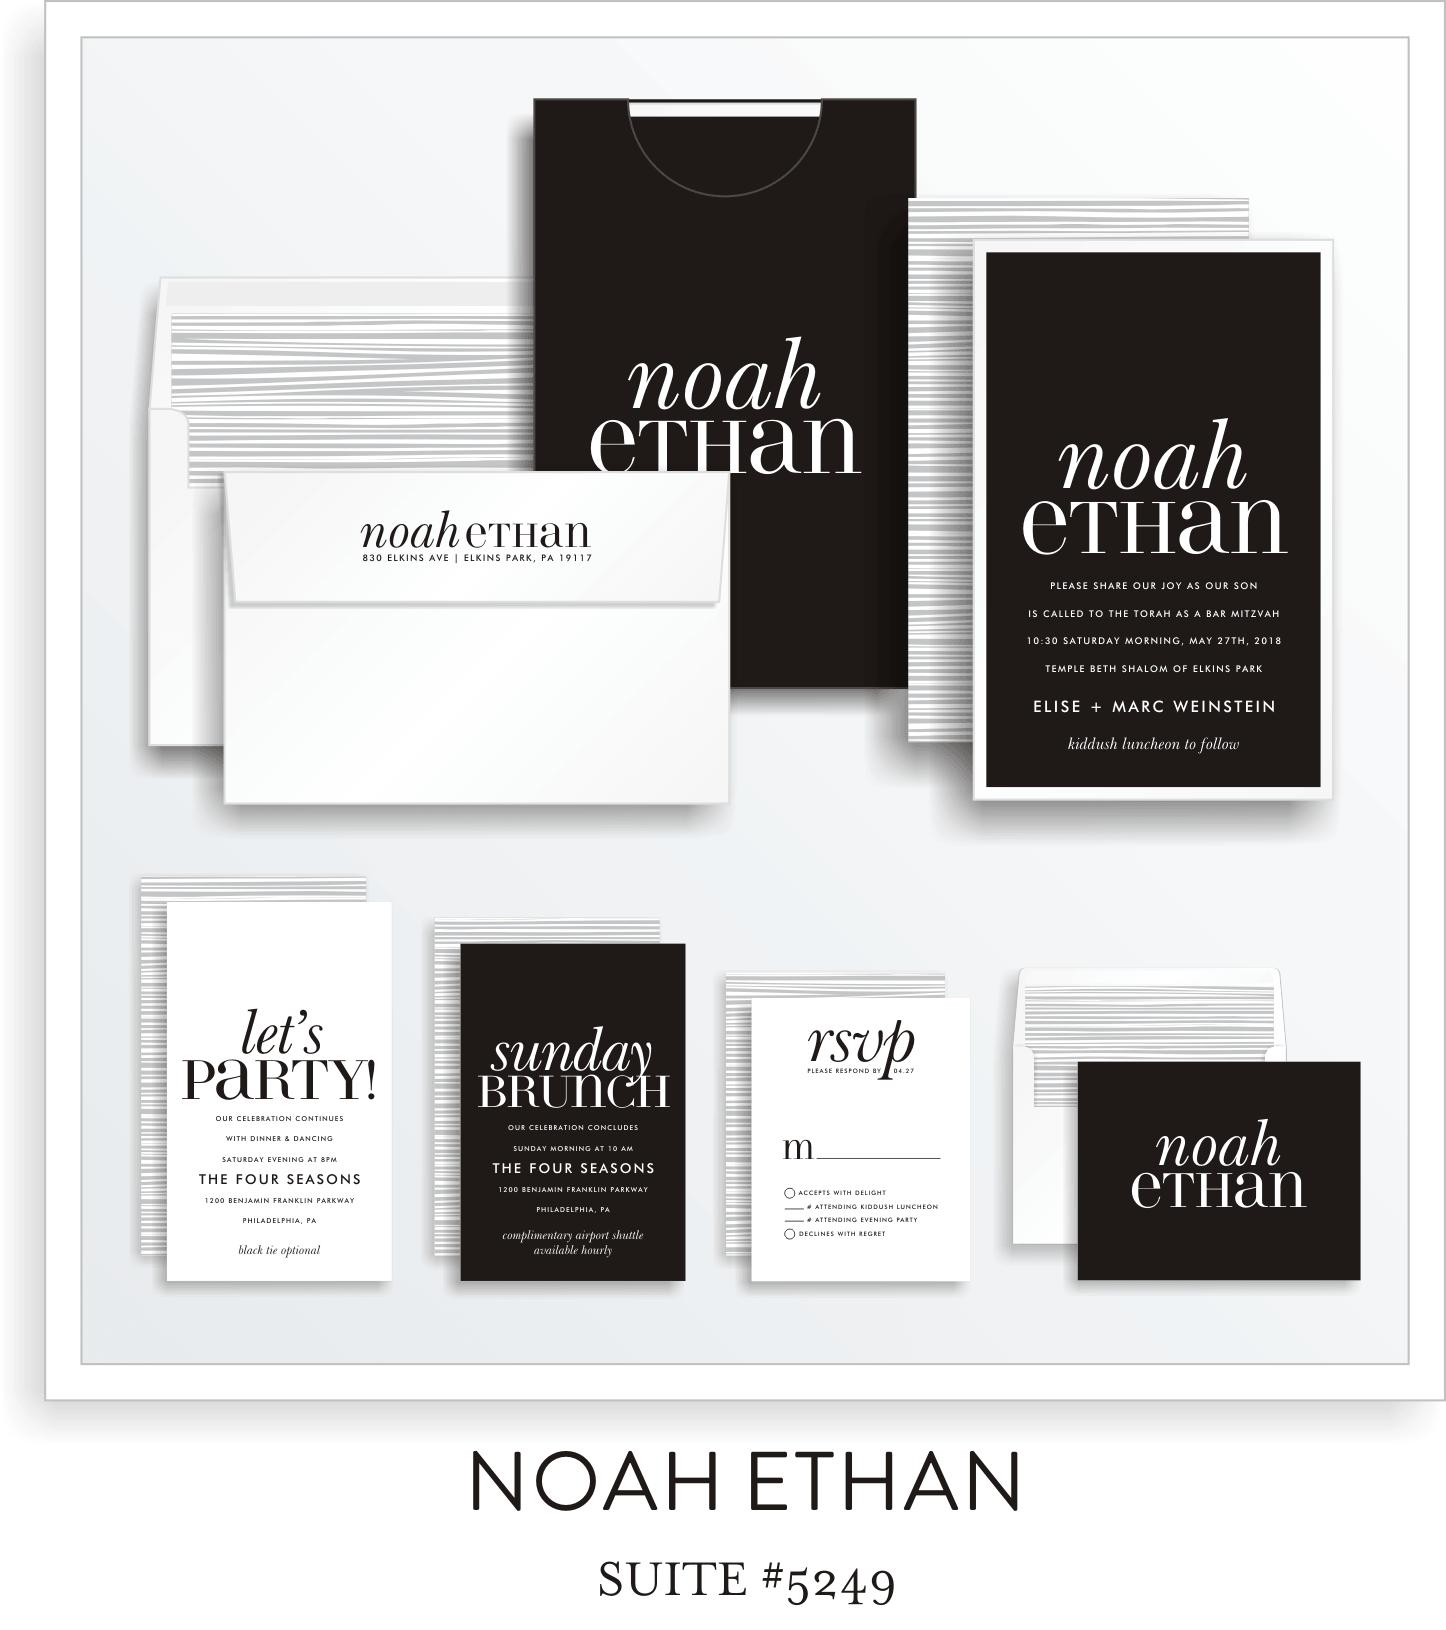 Copy of Copy of Bar Mitzvah Invitation Suite 5249 - Noah Ethan